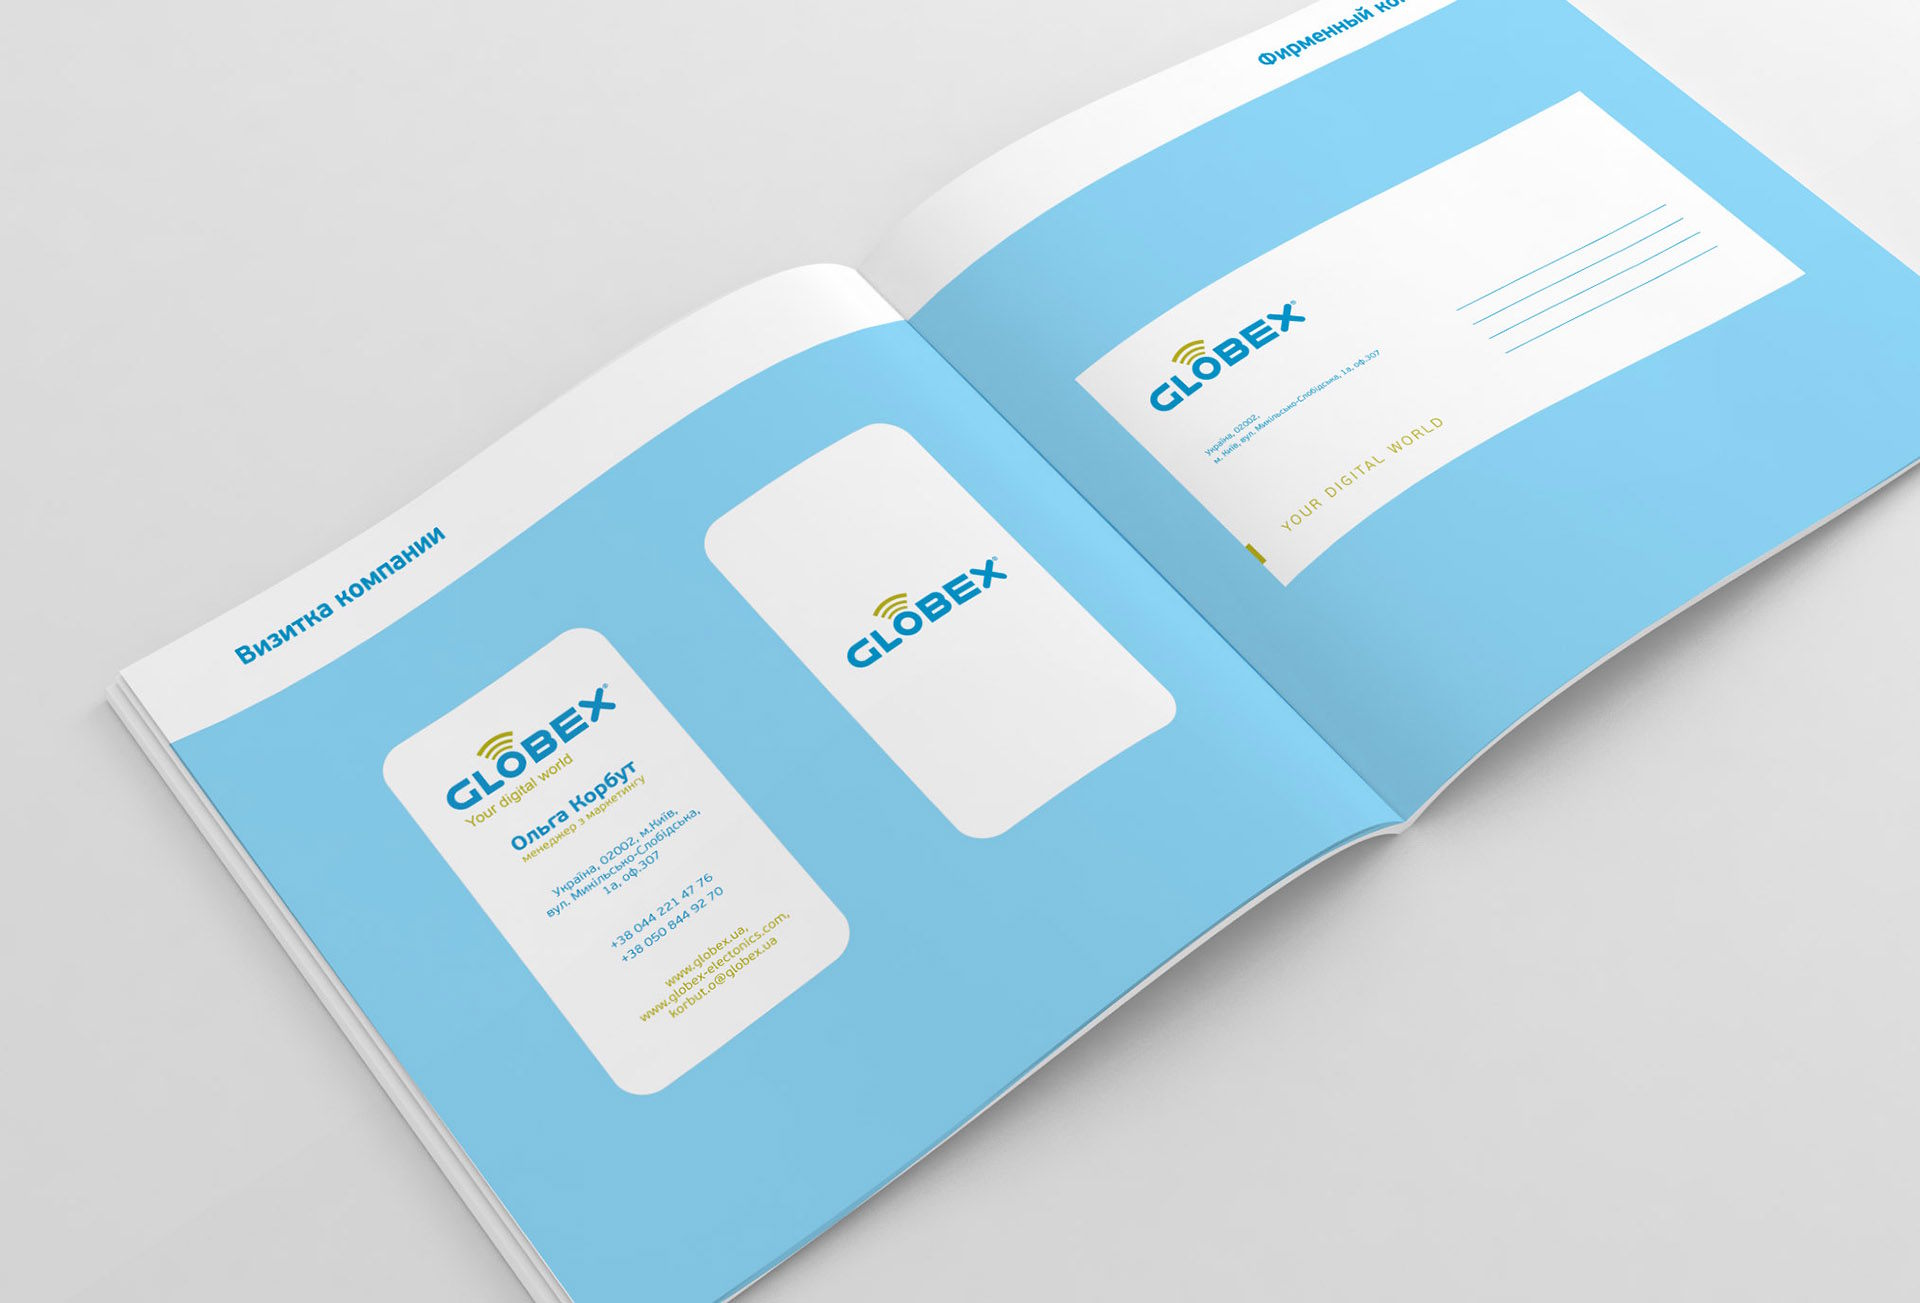 Создание брендбука IT компании, IT company brandbook development